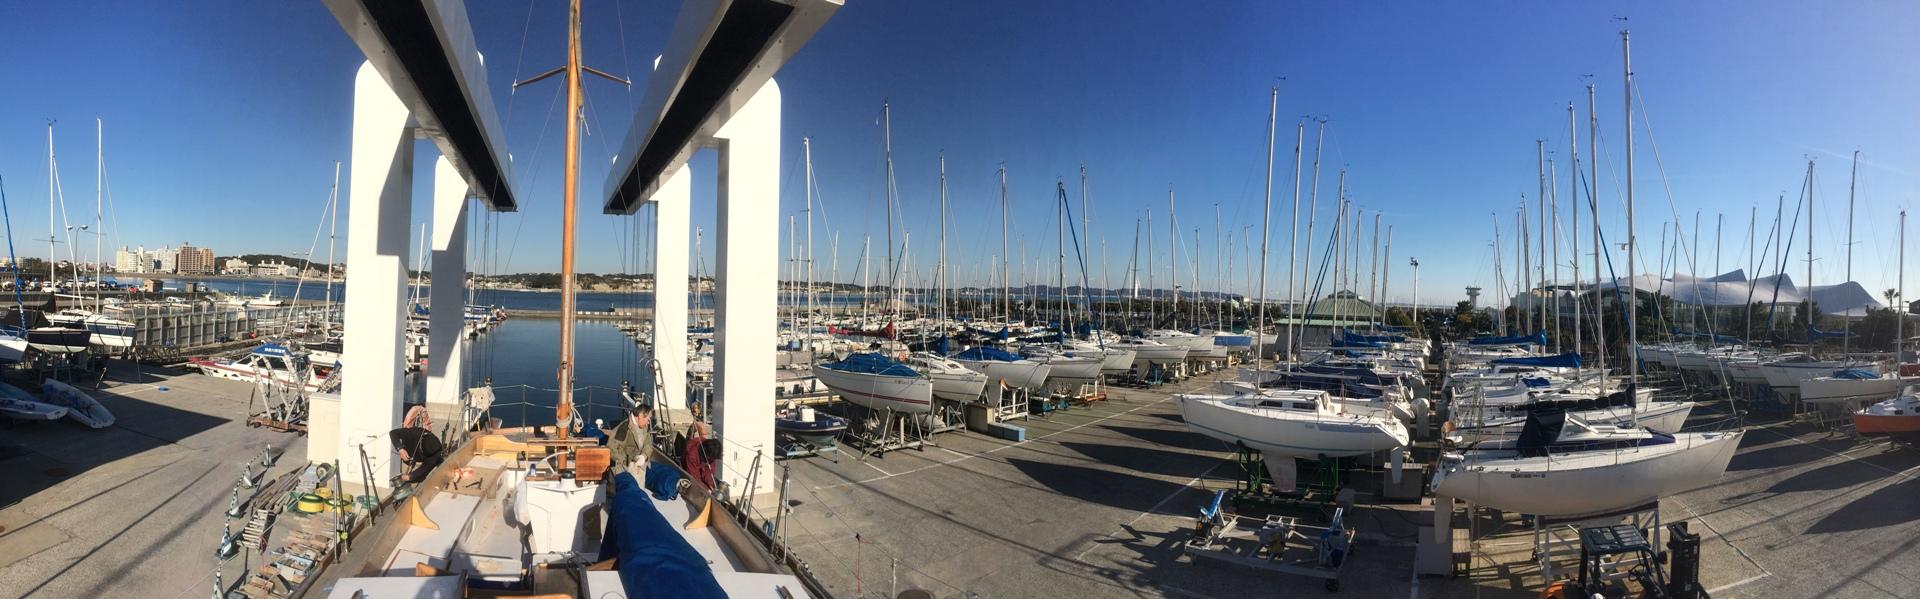 Enoshima Yacht Harbor